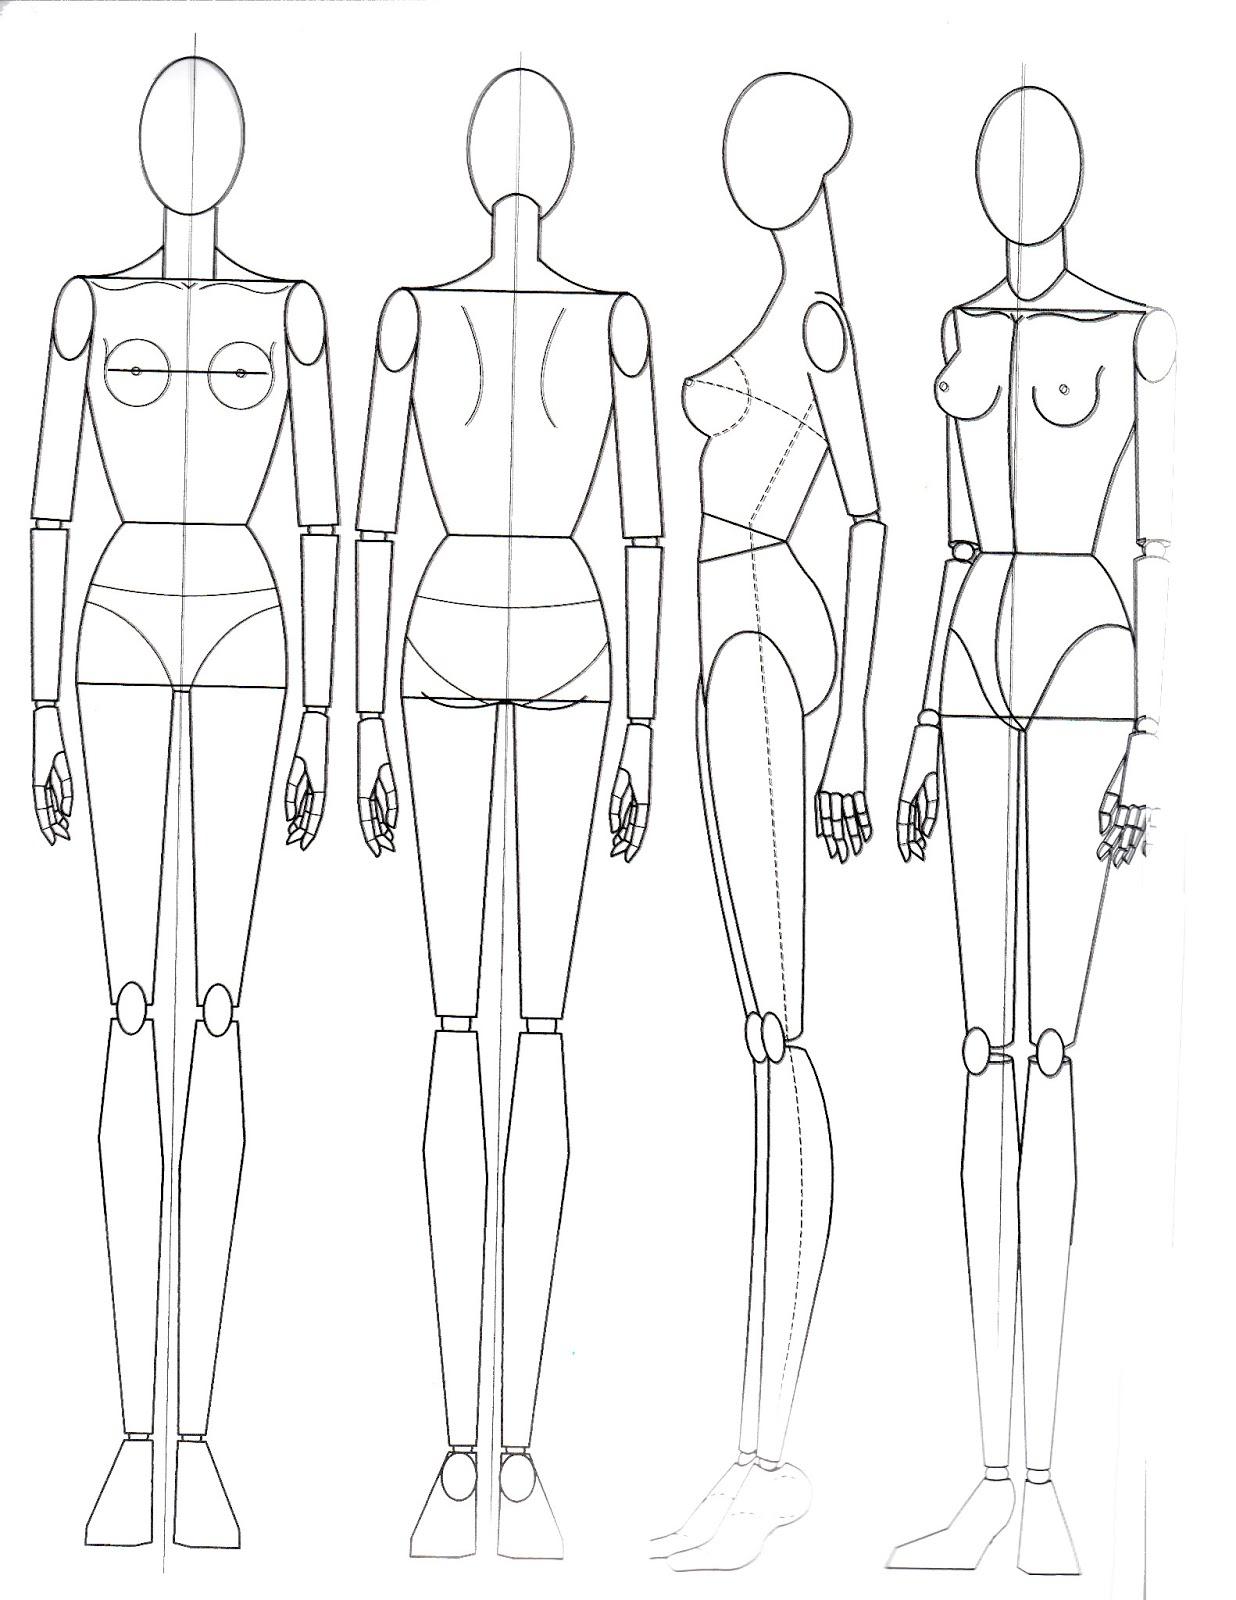 Paper Doll School The Basics Of Anatomy